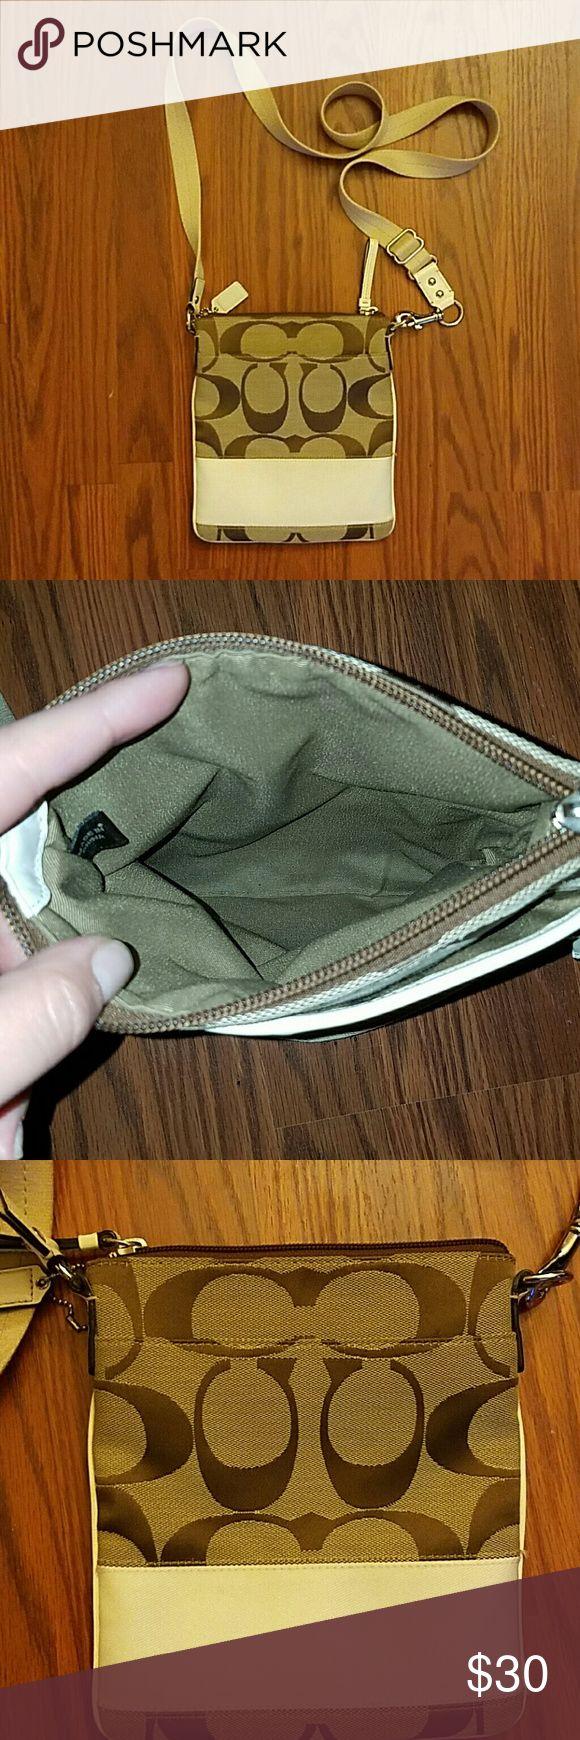 💥sale!💥 Coach swingpack Great condition coach swingpack cross body purse Coach Bags Crossbody Bags